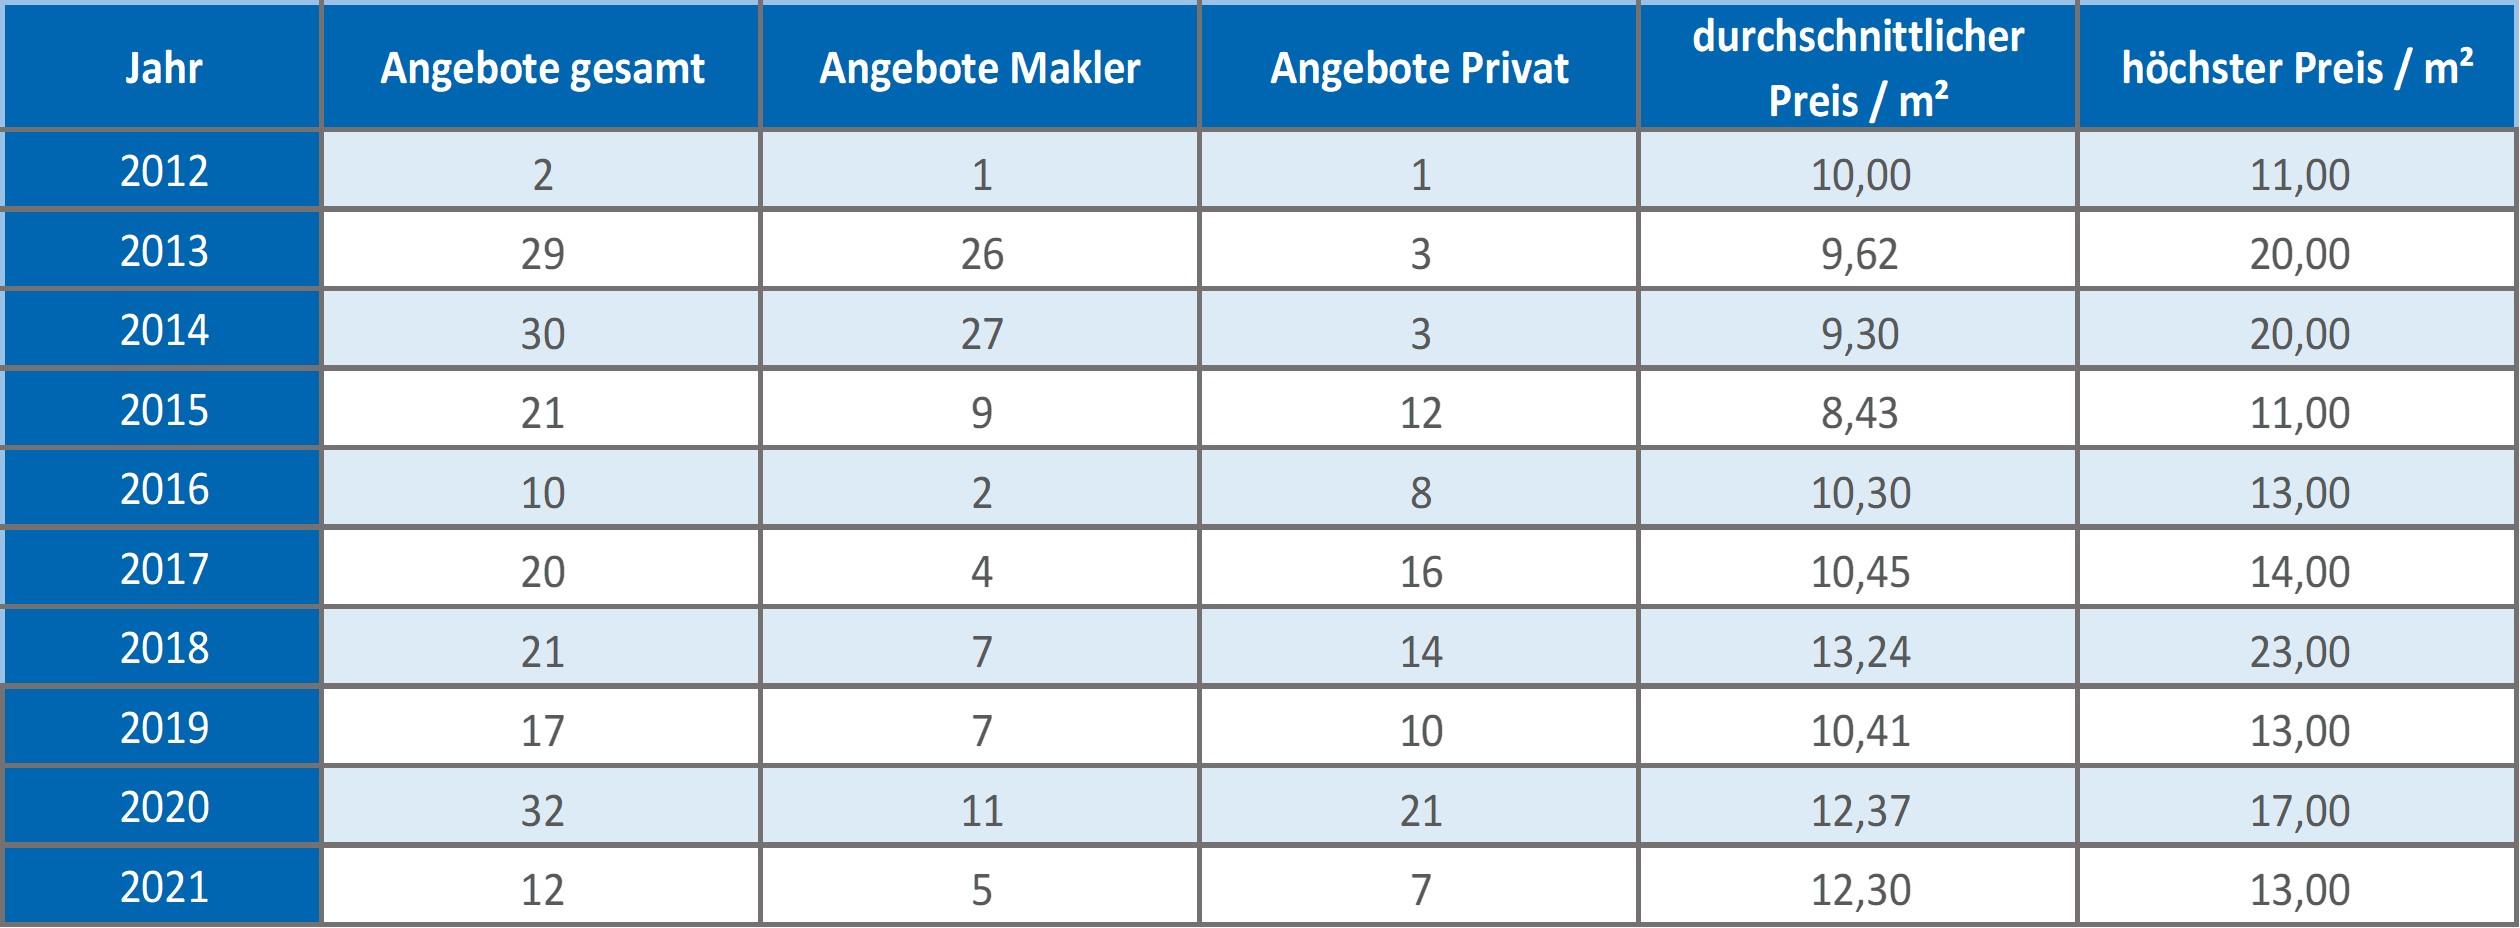 Lenggries Wohnung mieten vermieten Preis Bewertung Makler www.happy-immo.de 2019 2020 2021